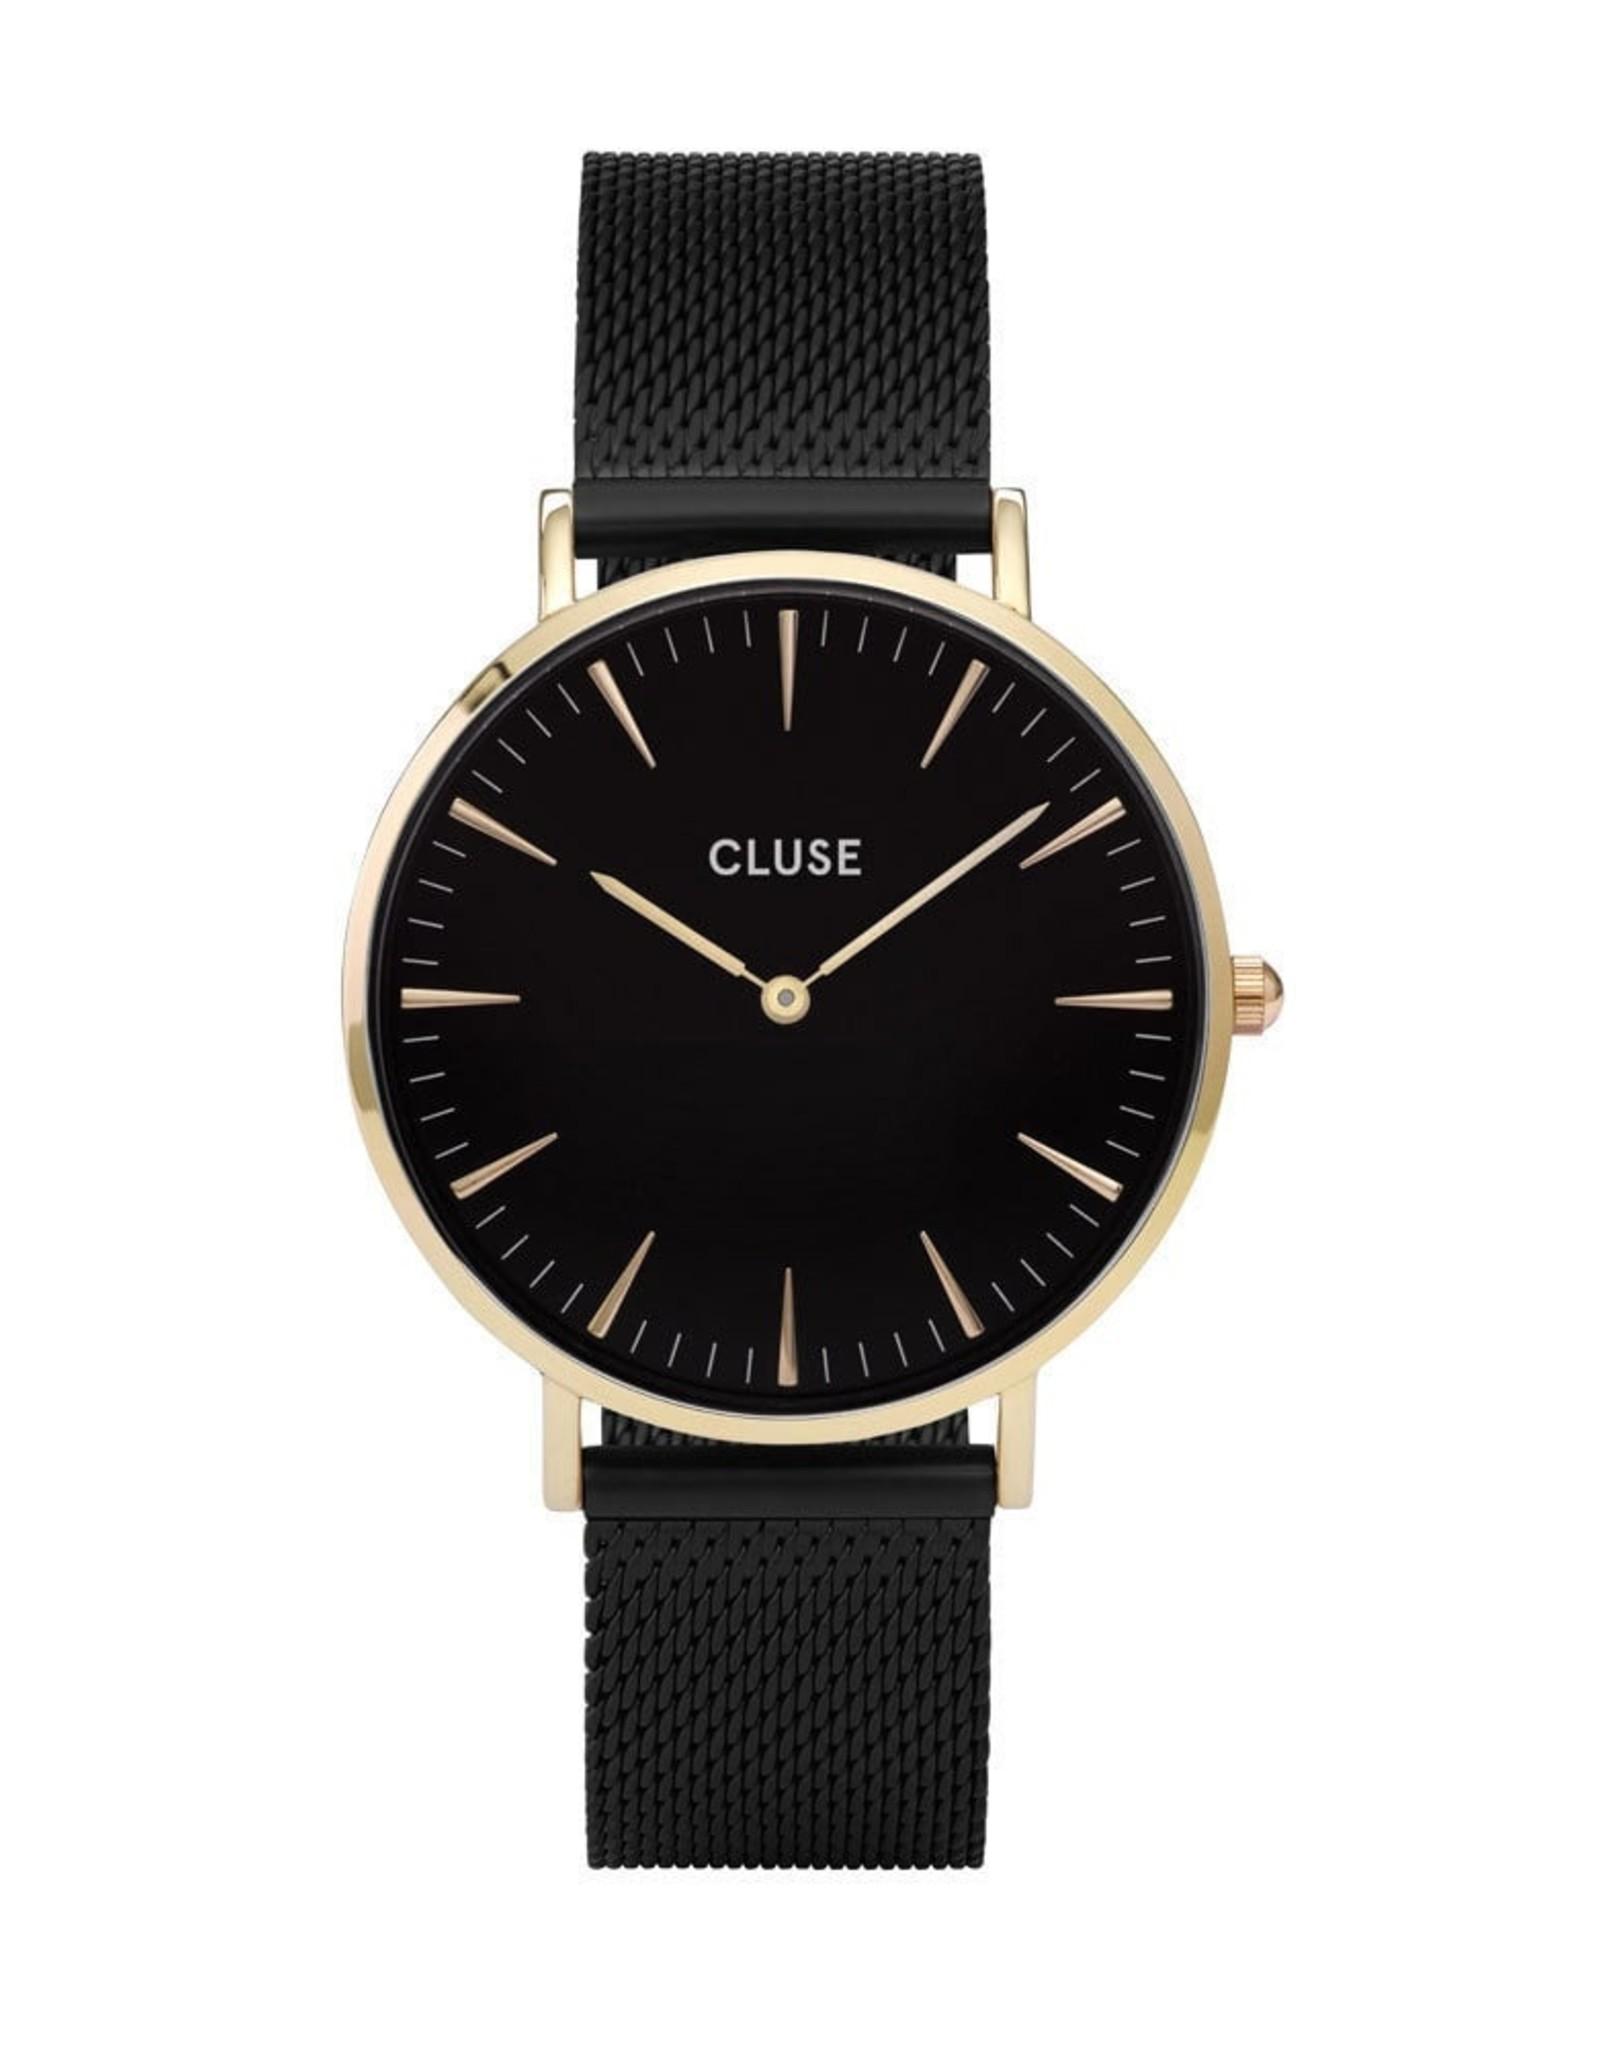 Cluse Boho Chic Mesh Black, Gold Colour